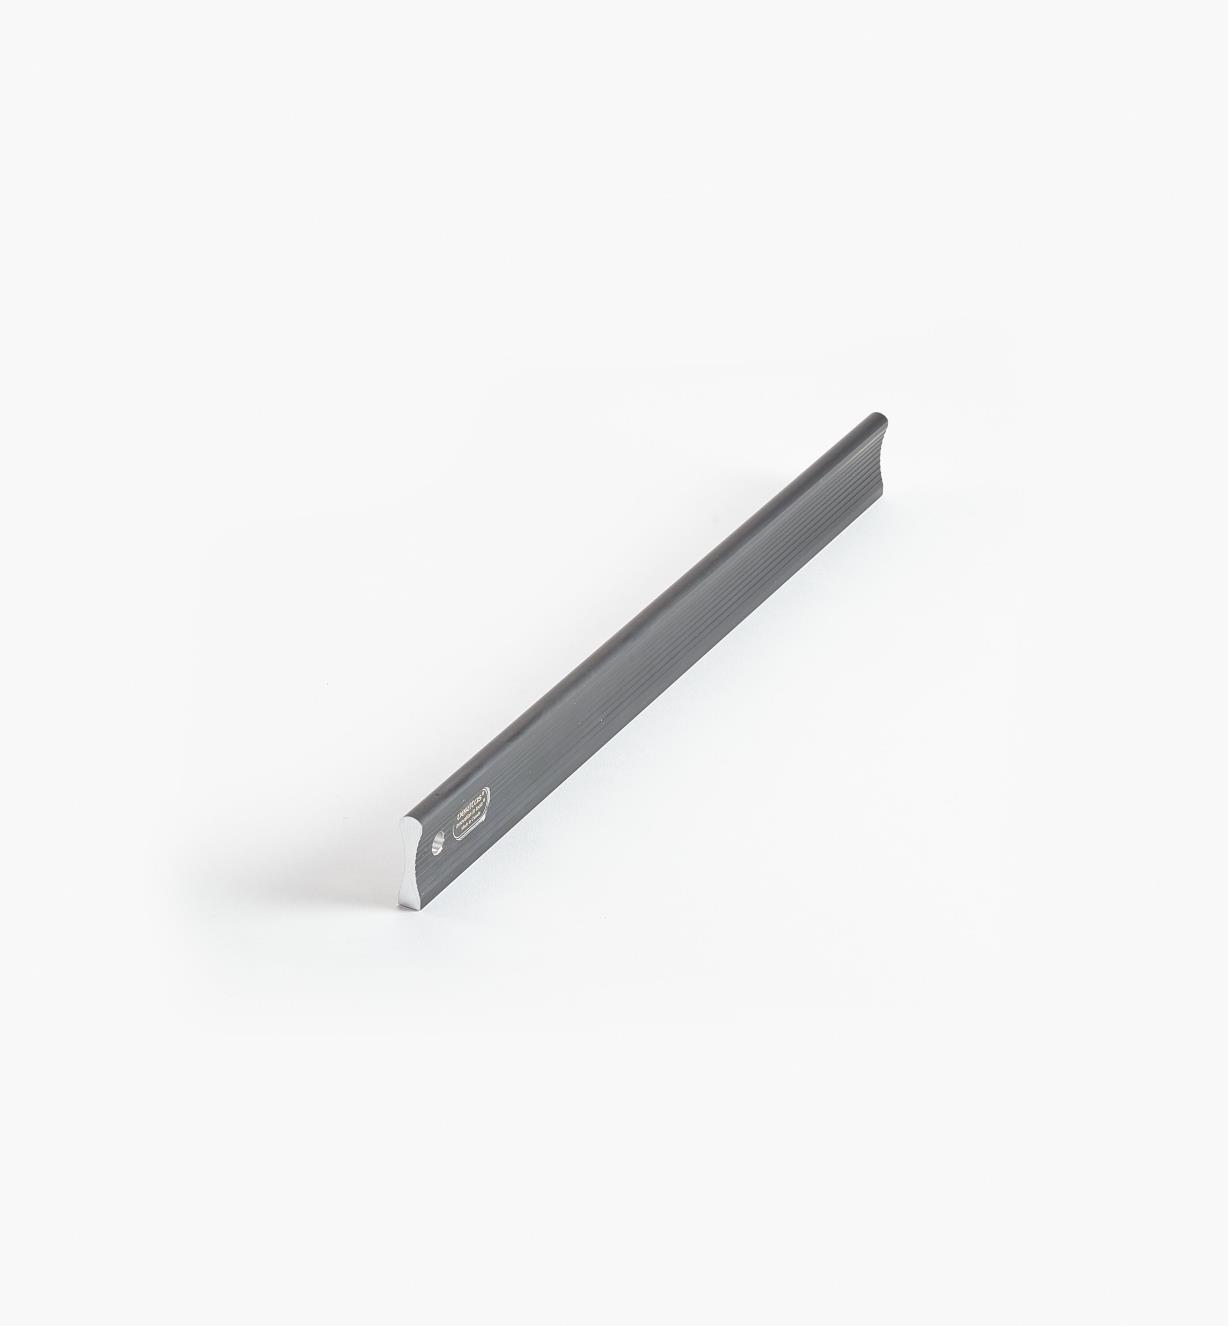 05N6300 - Règle rectifiée en aluminium Veritas, 18po